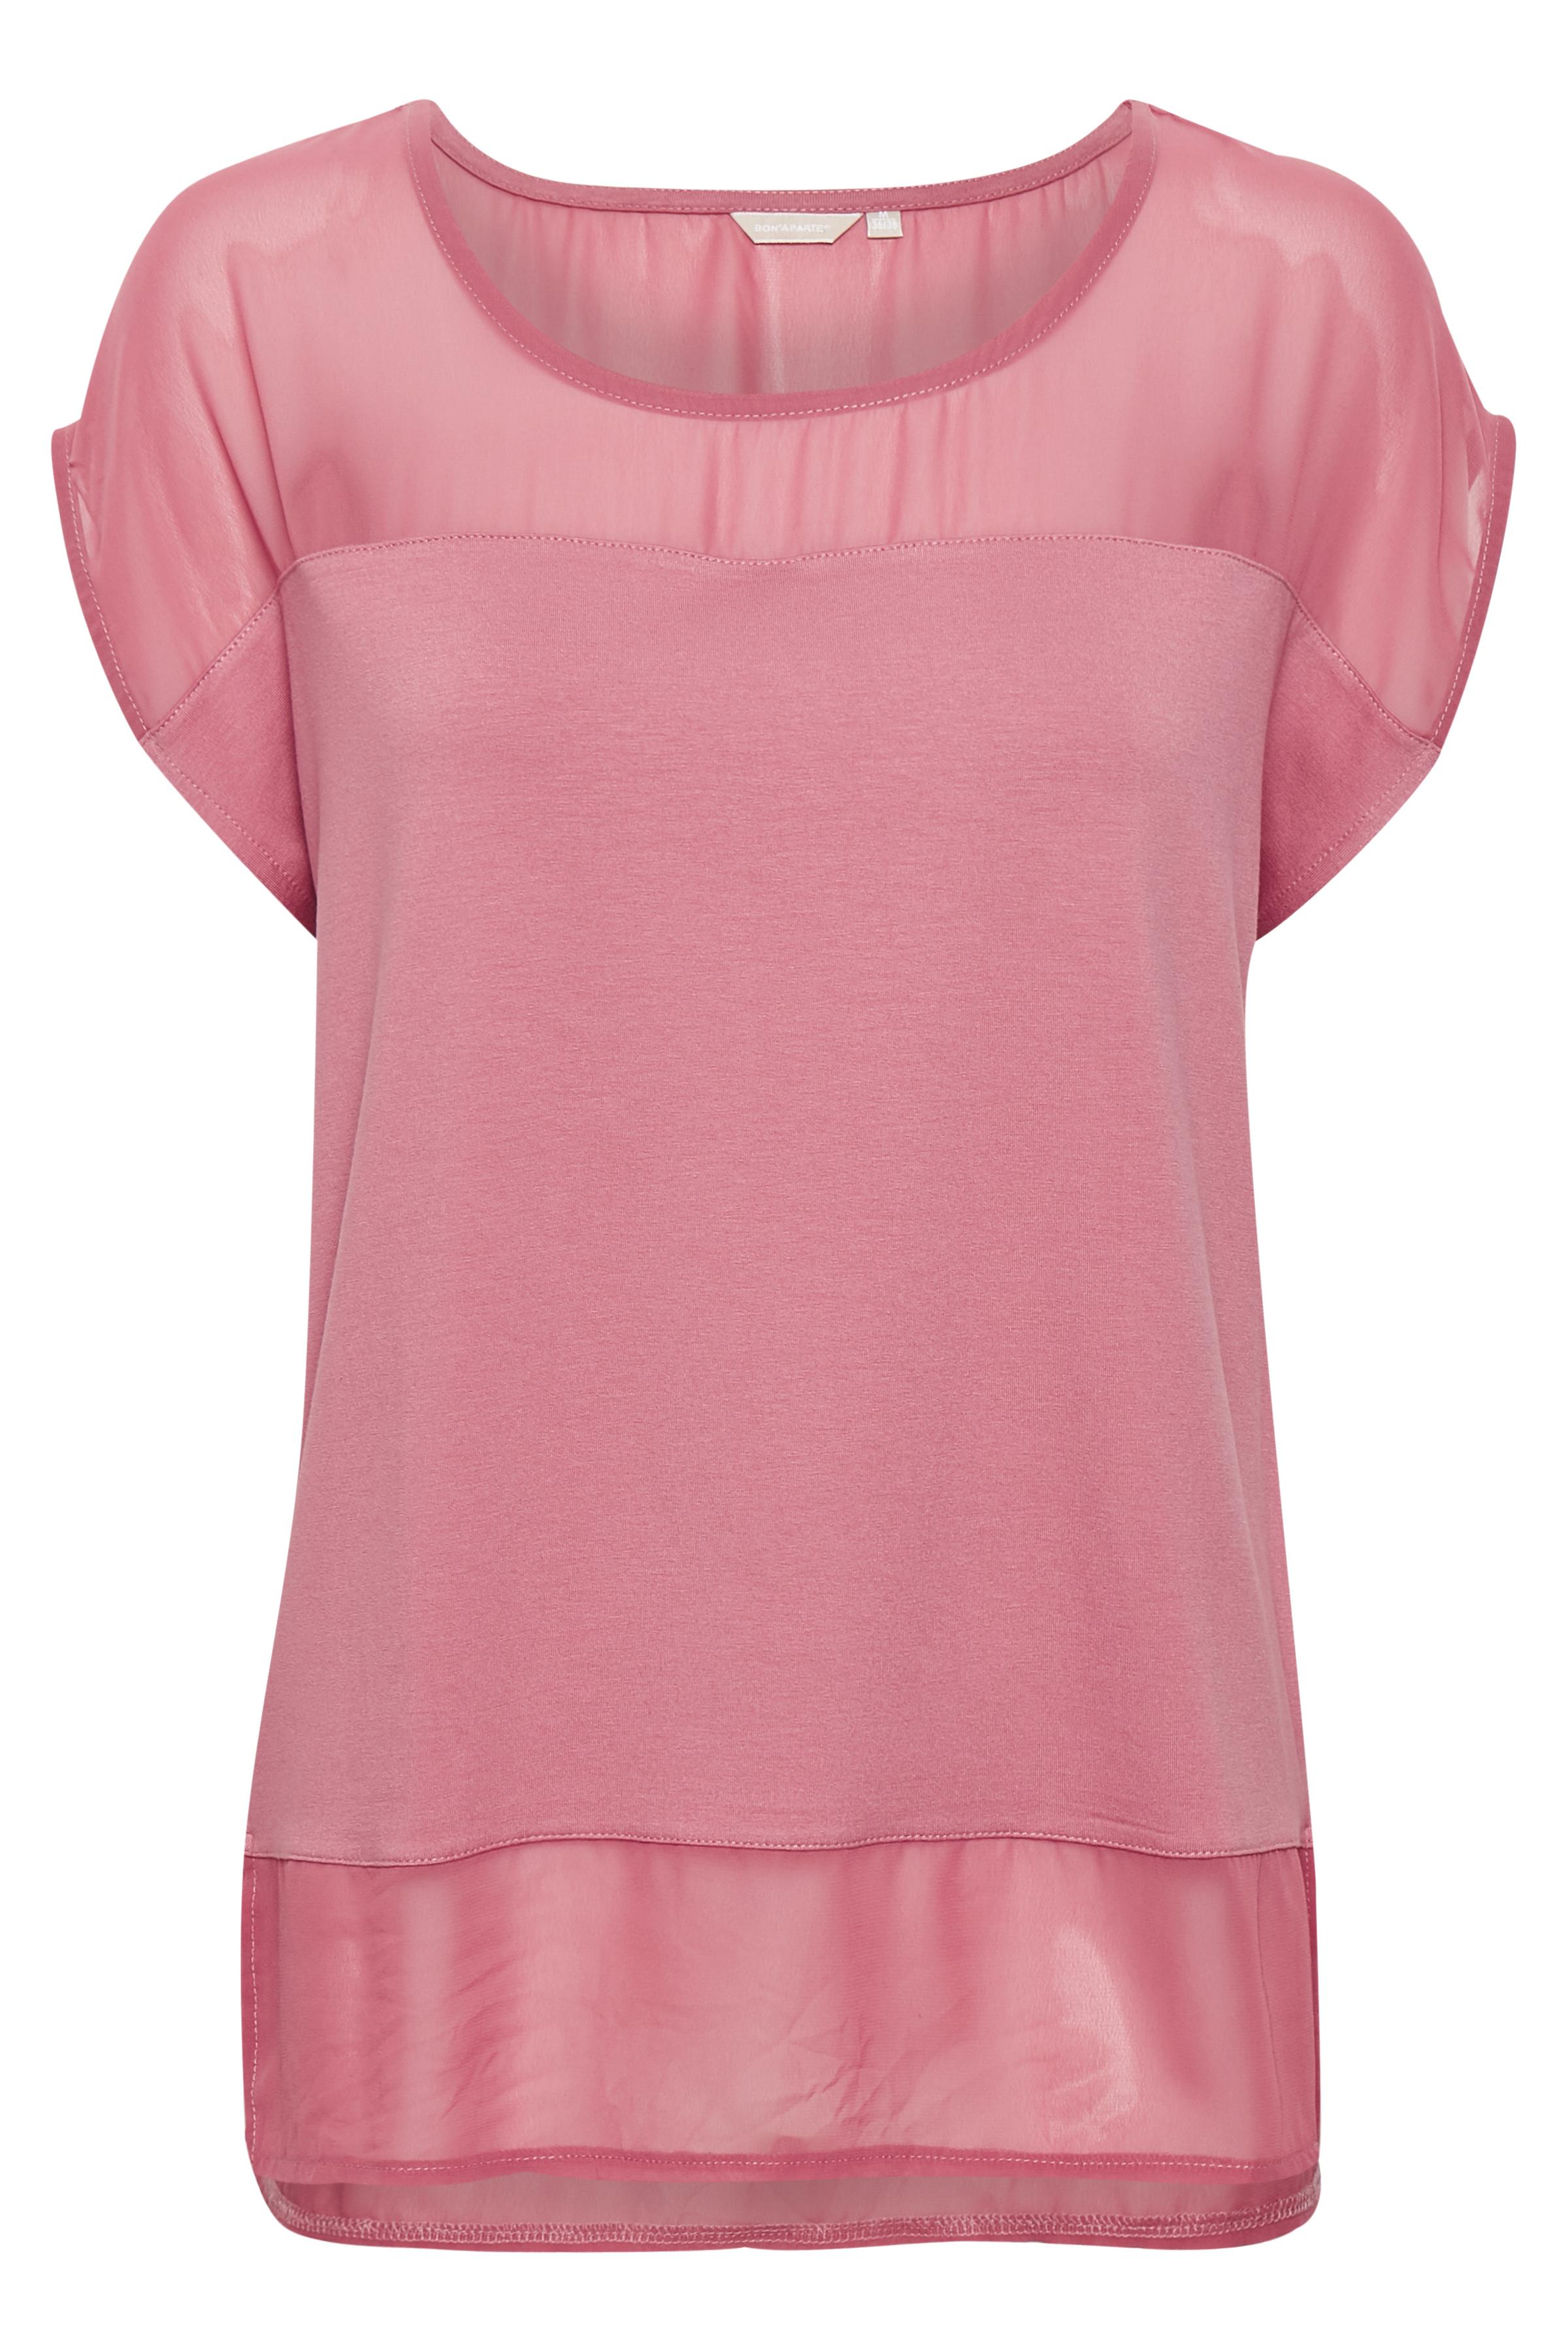 Image of BonA Parte Dame T-shirt - Mørk rosa